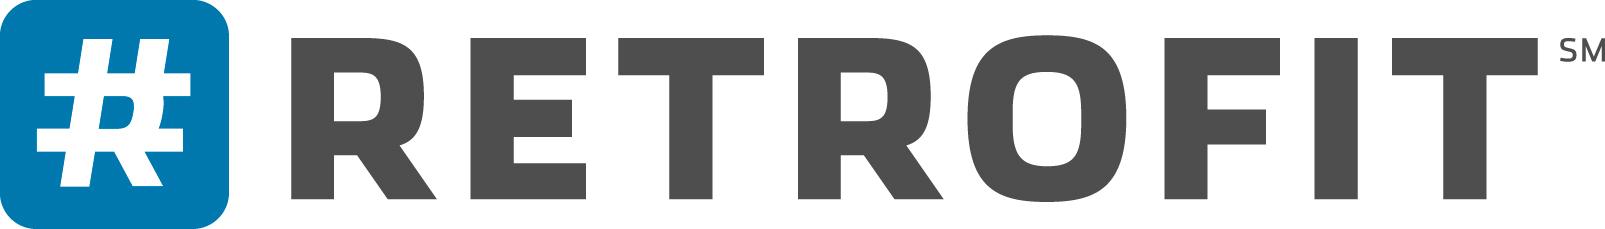 retrofit_logo.jpg